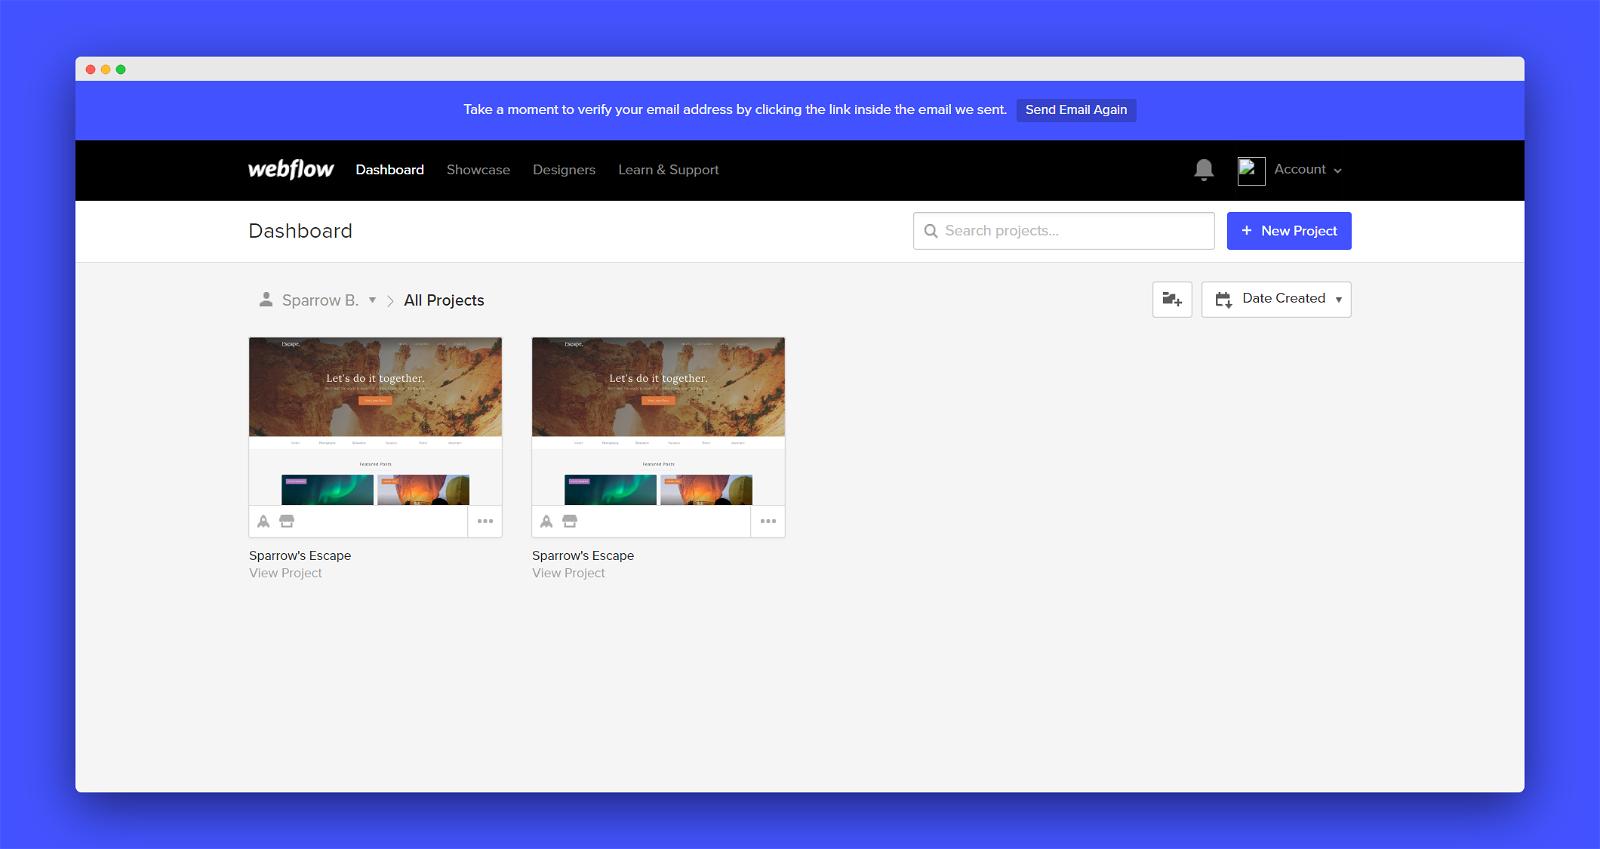 Webflow Screenshot 2